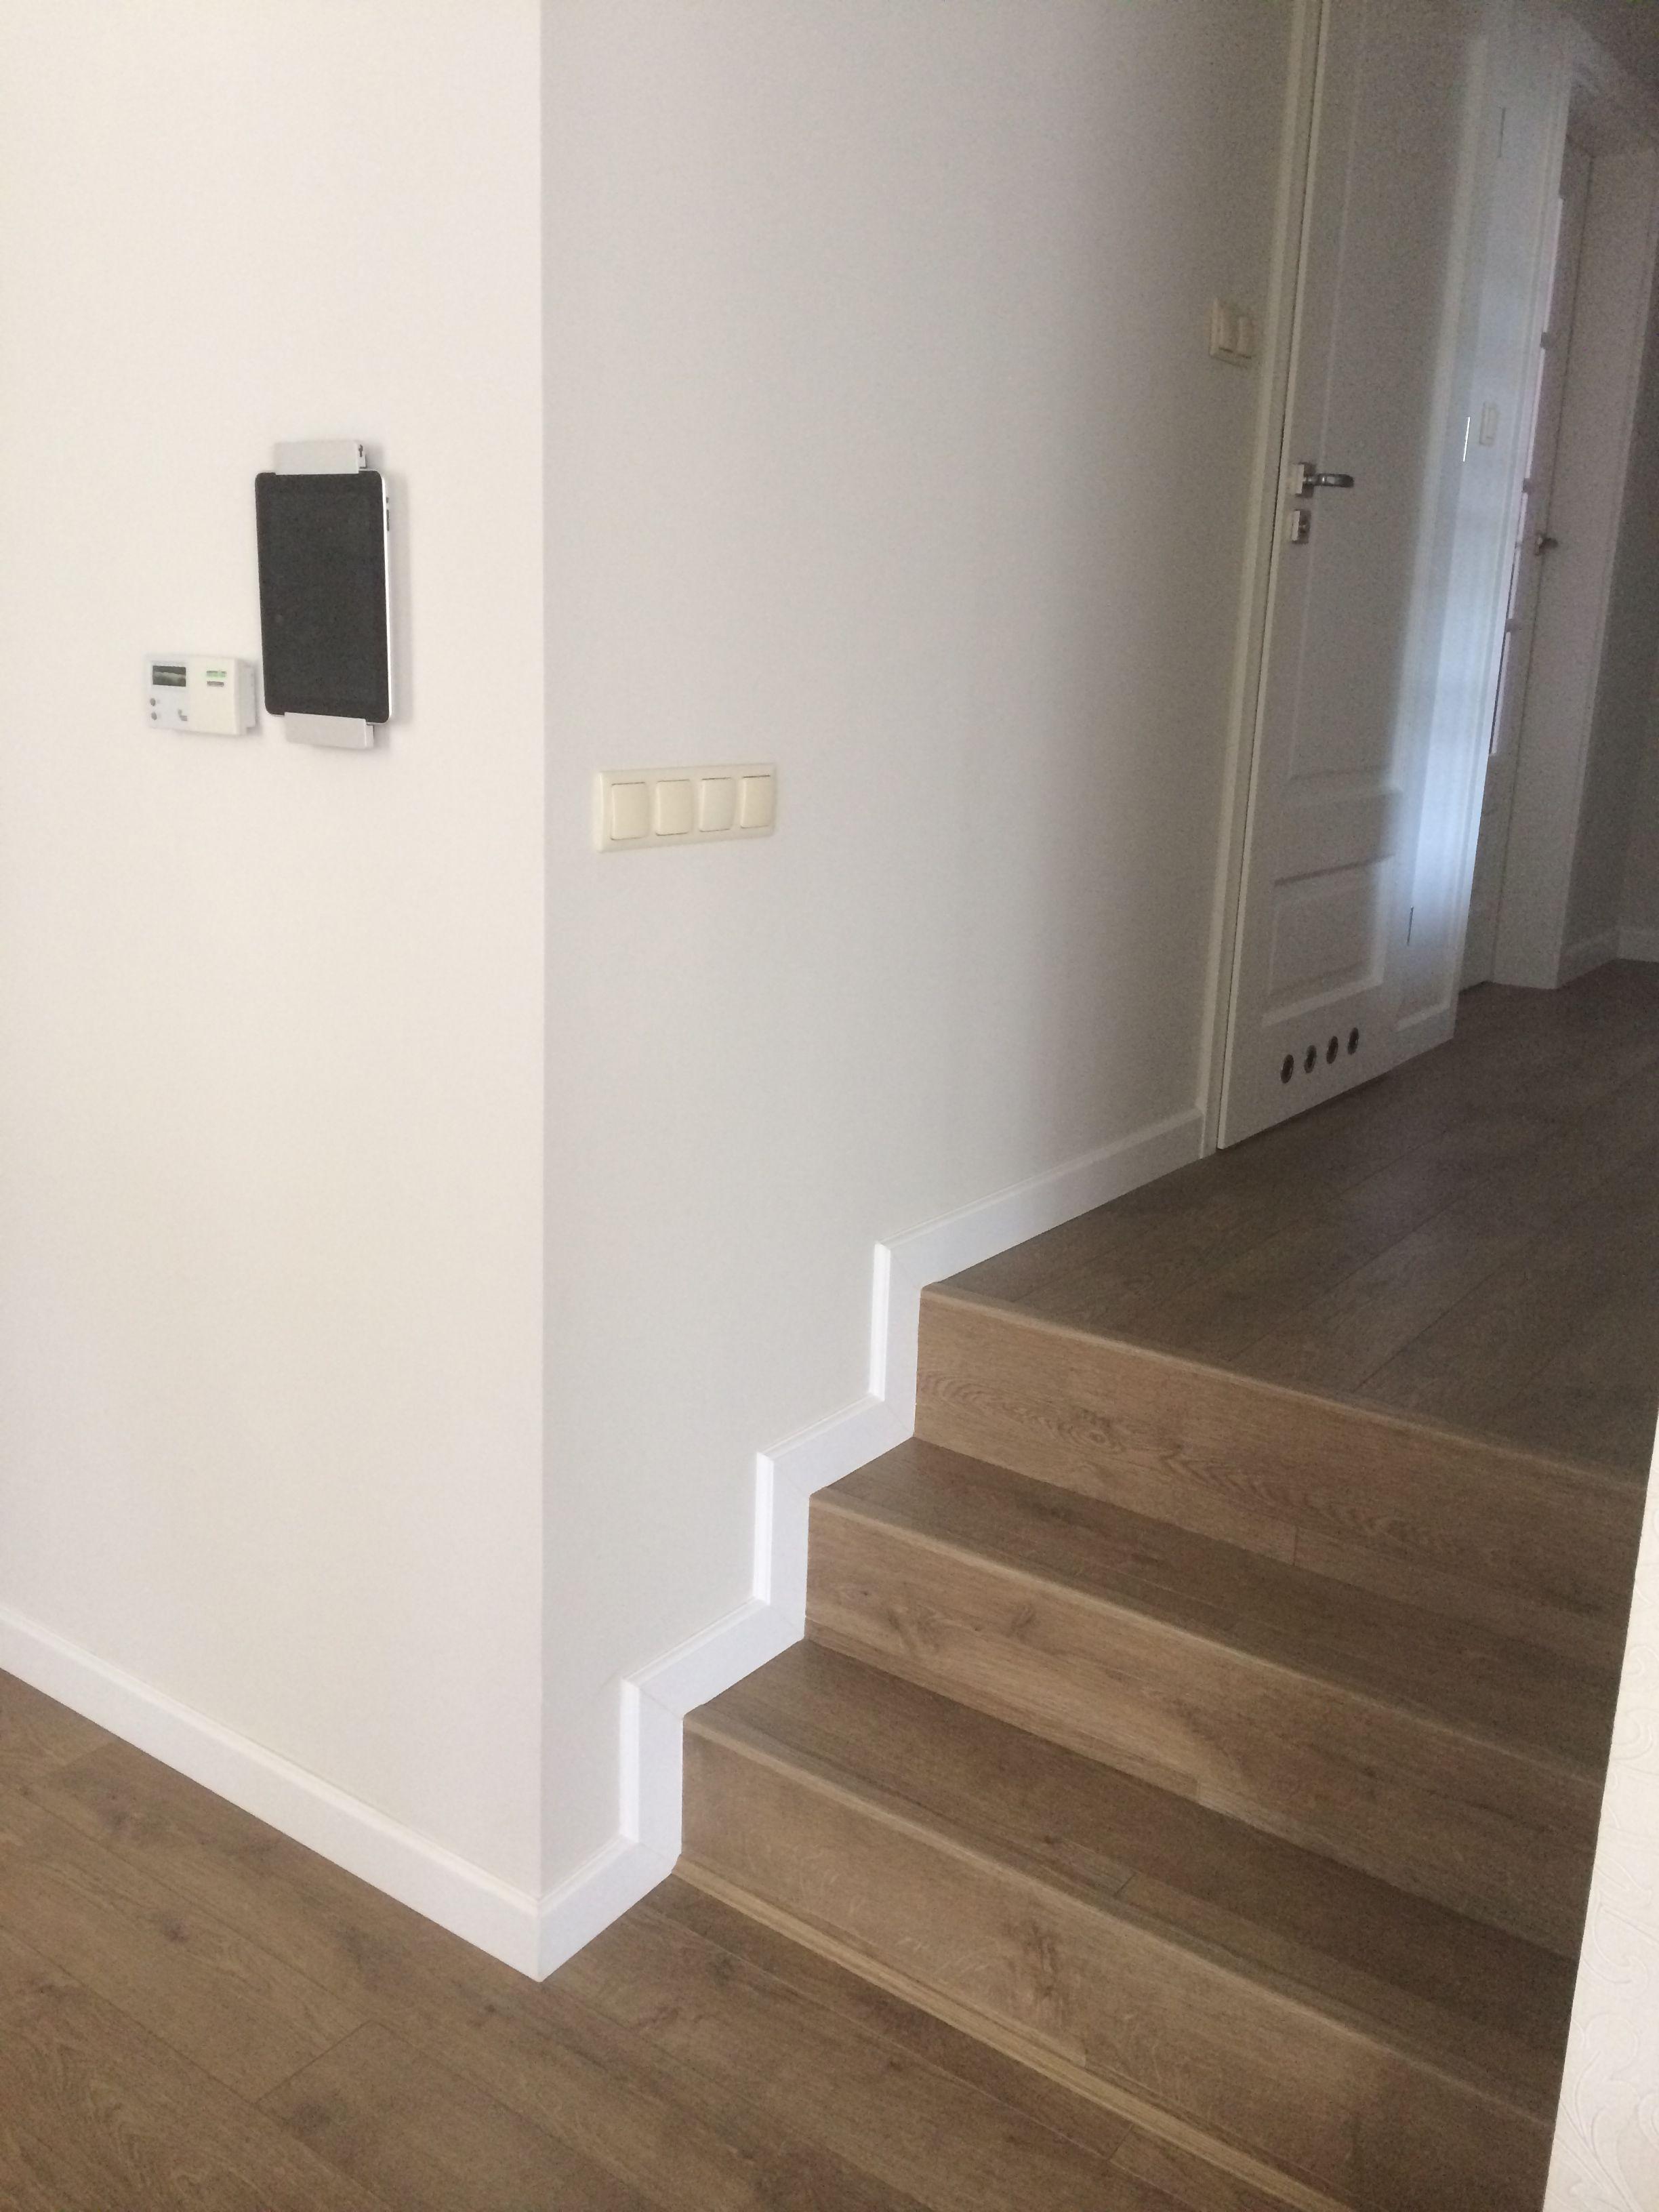 Schody Quick-Step UF 312 Perspective, Listwa Paint-It Decora, ściany farby